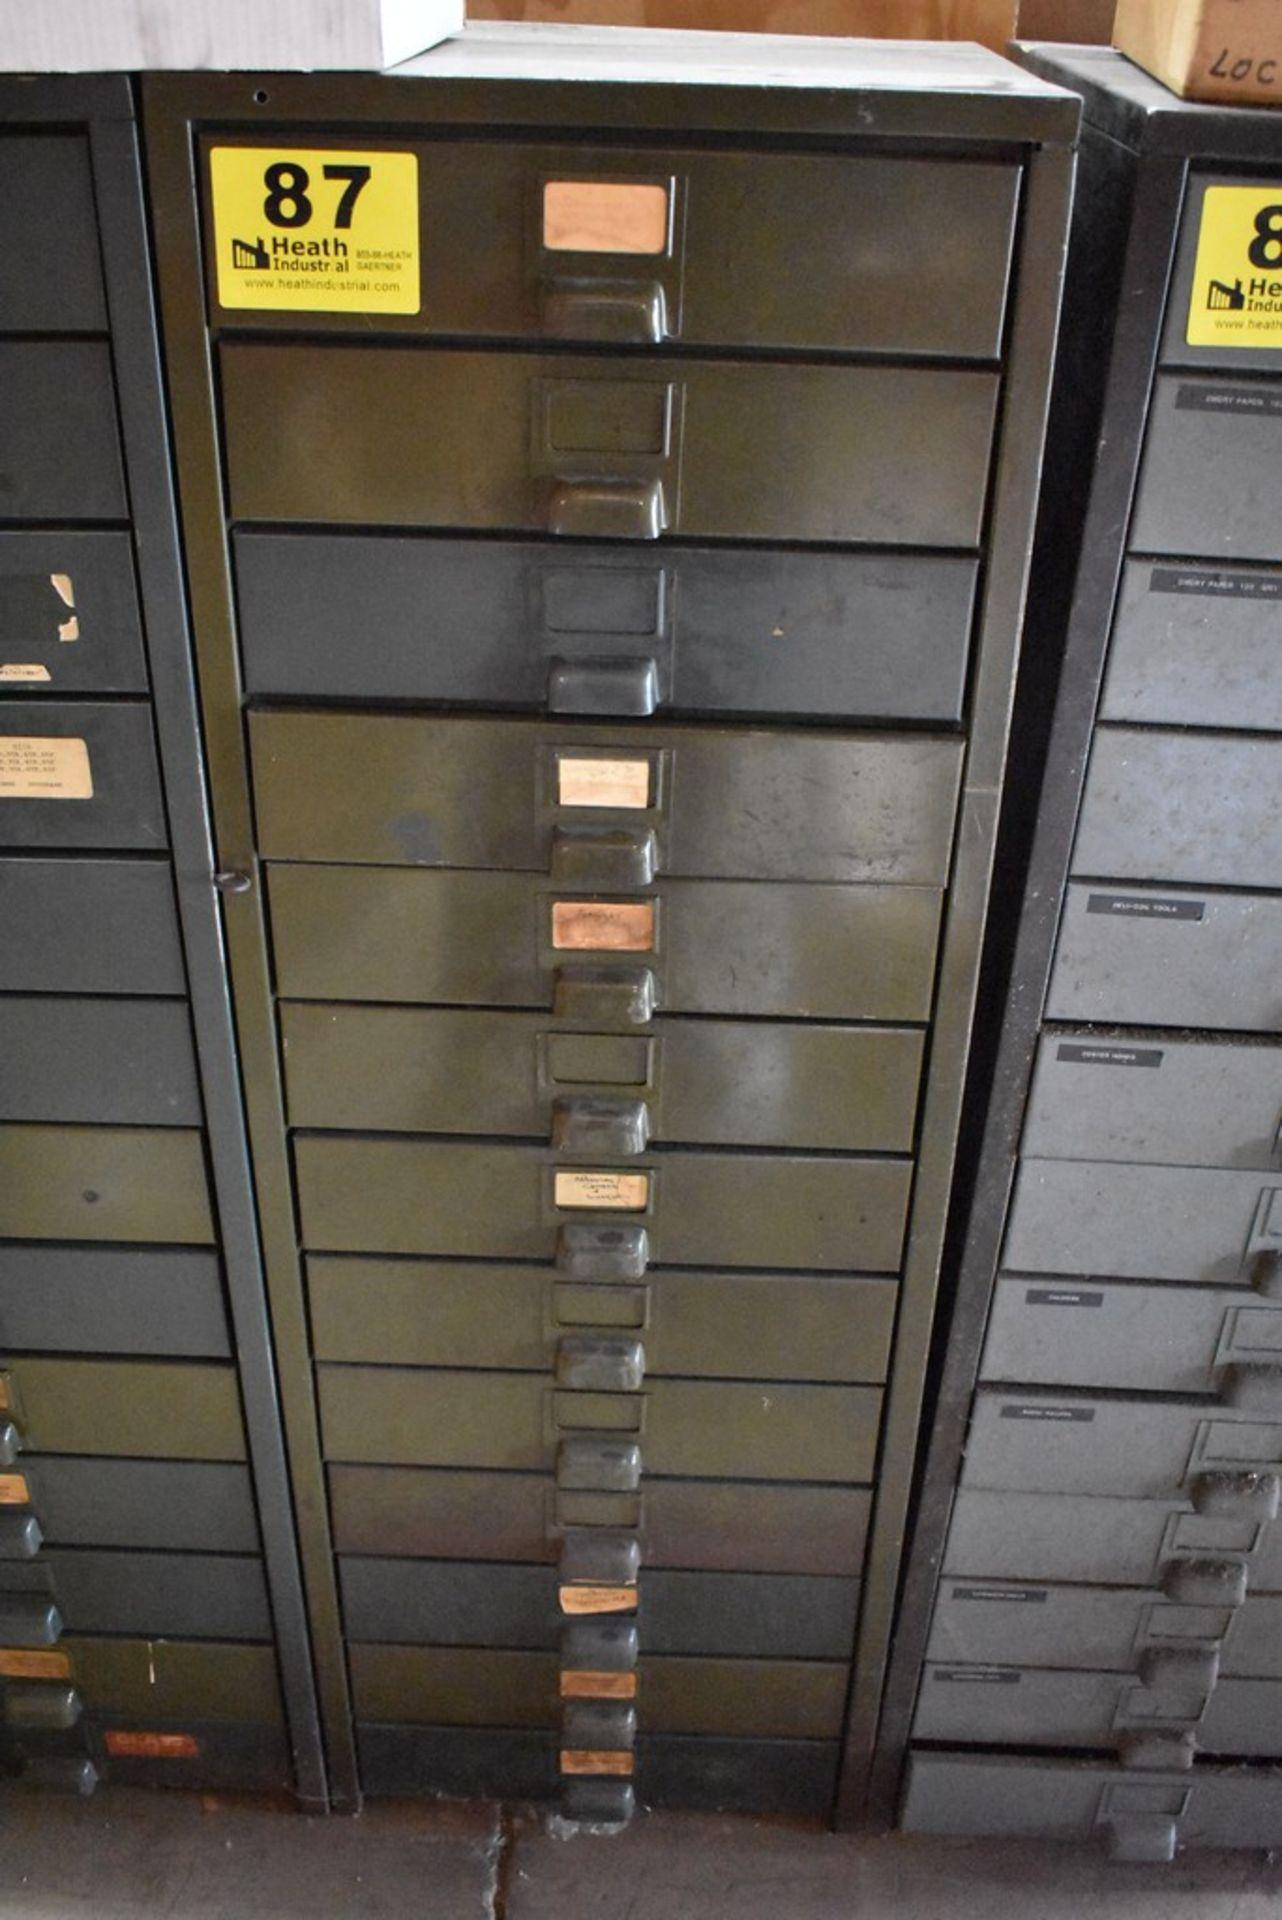 HOBART THIRTEEN DRAWER STEEL TOOL CABINET - Image 2 of 2